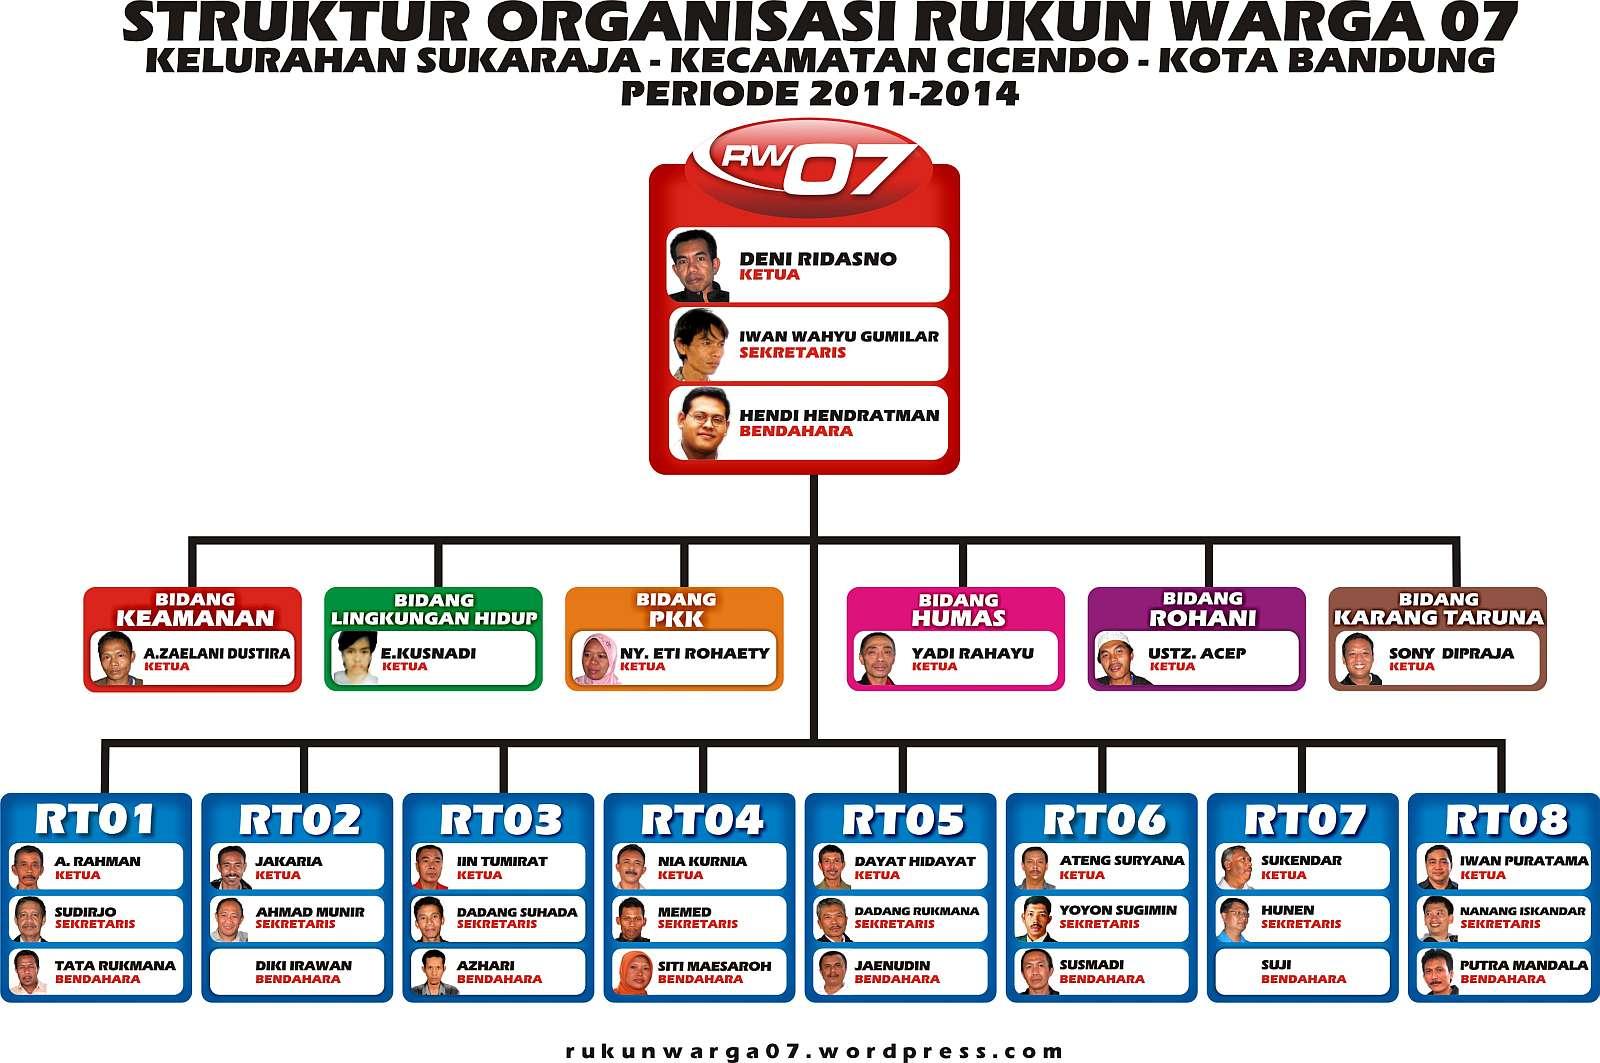 Struktur Organisasi Rukun Warga (RW) 07